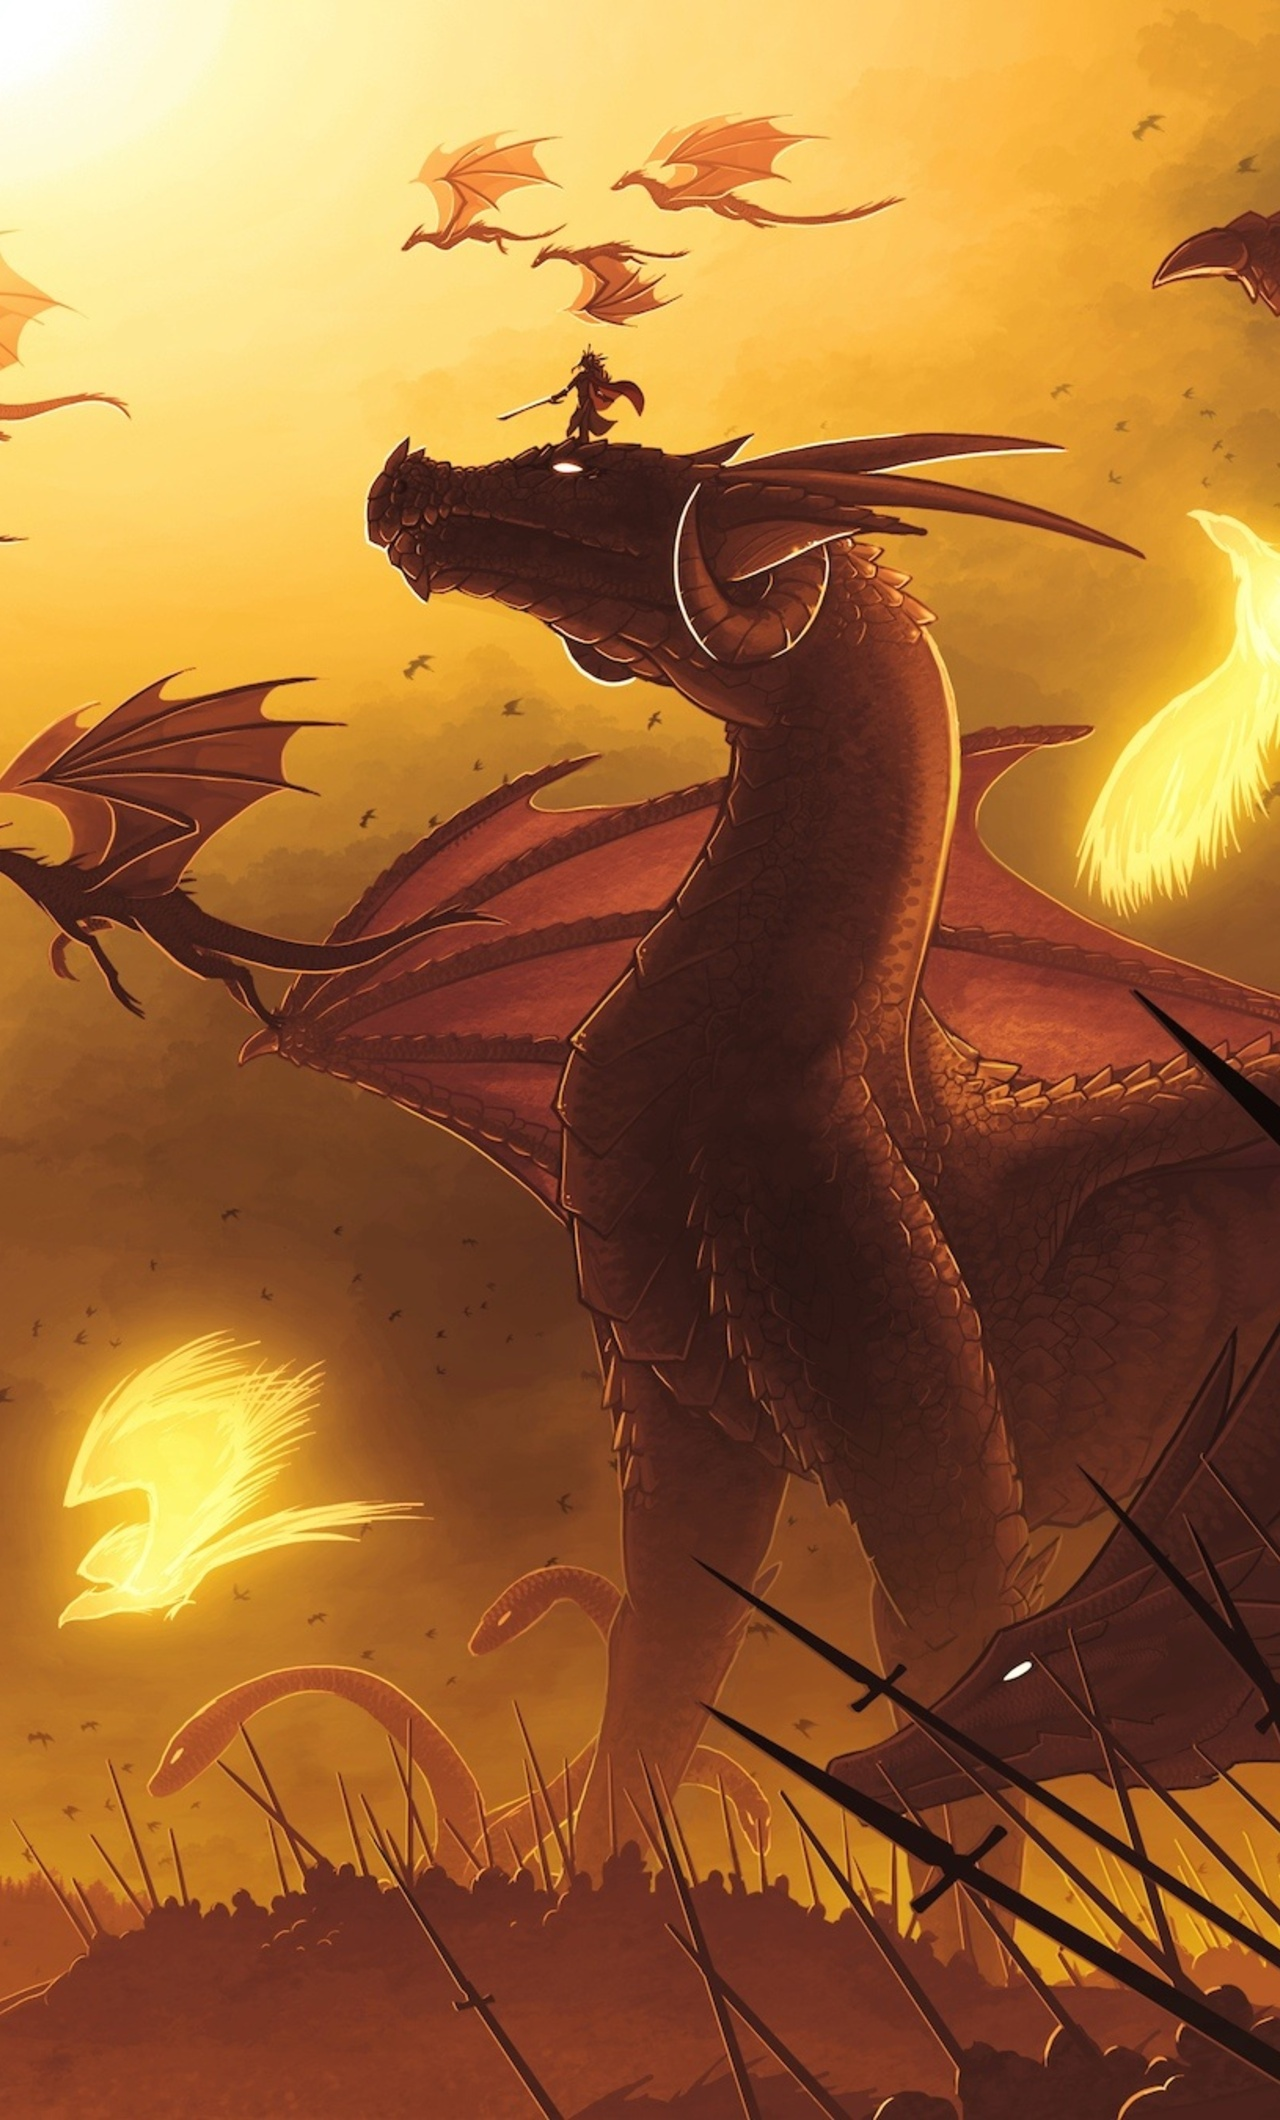 war-with-dragons-g4.jpg